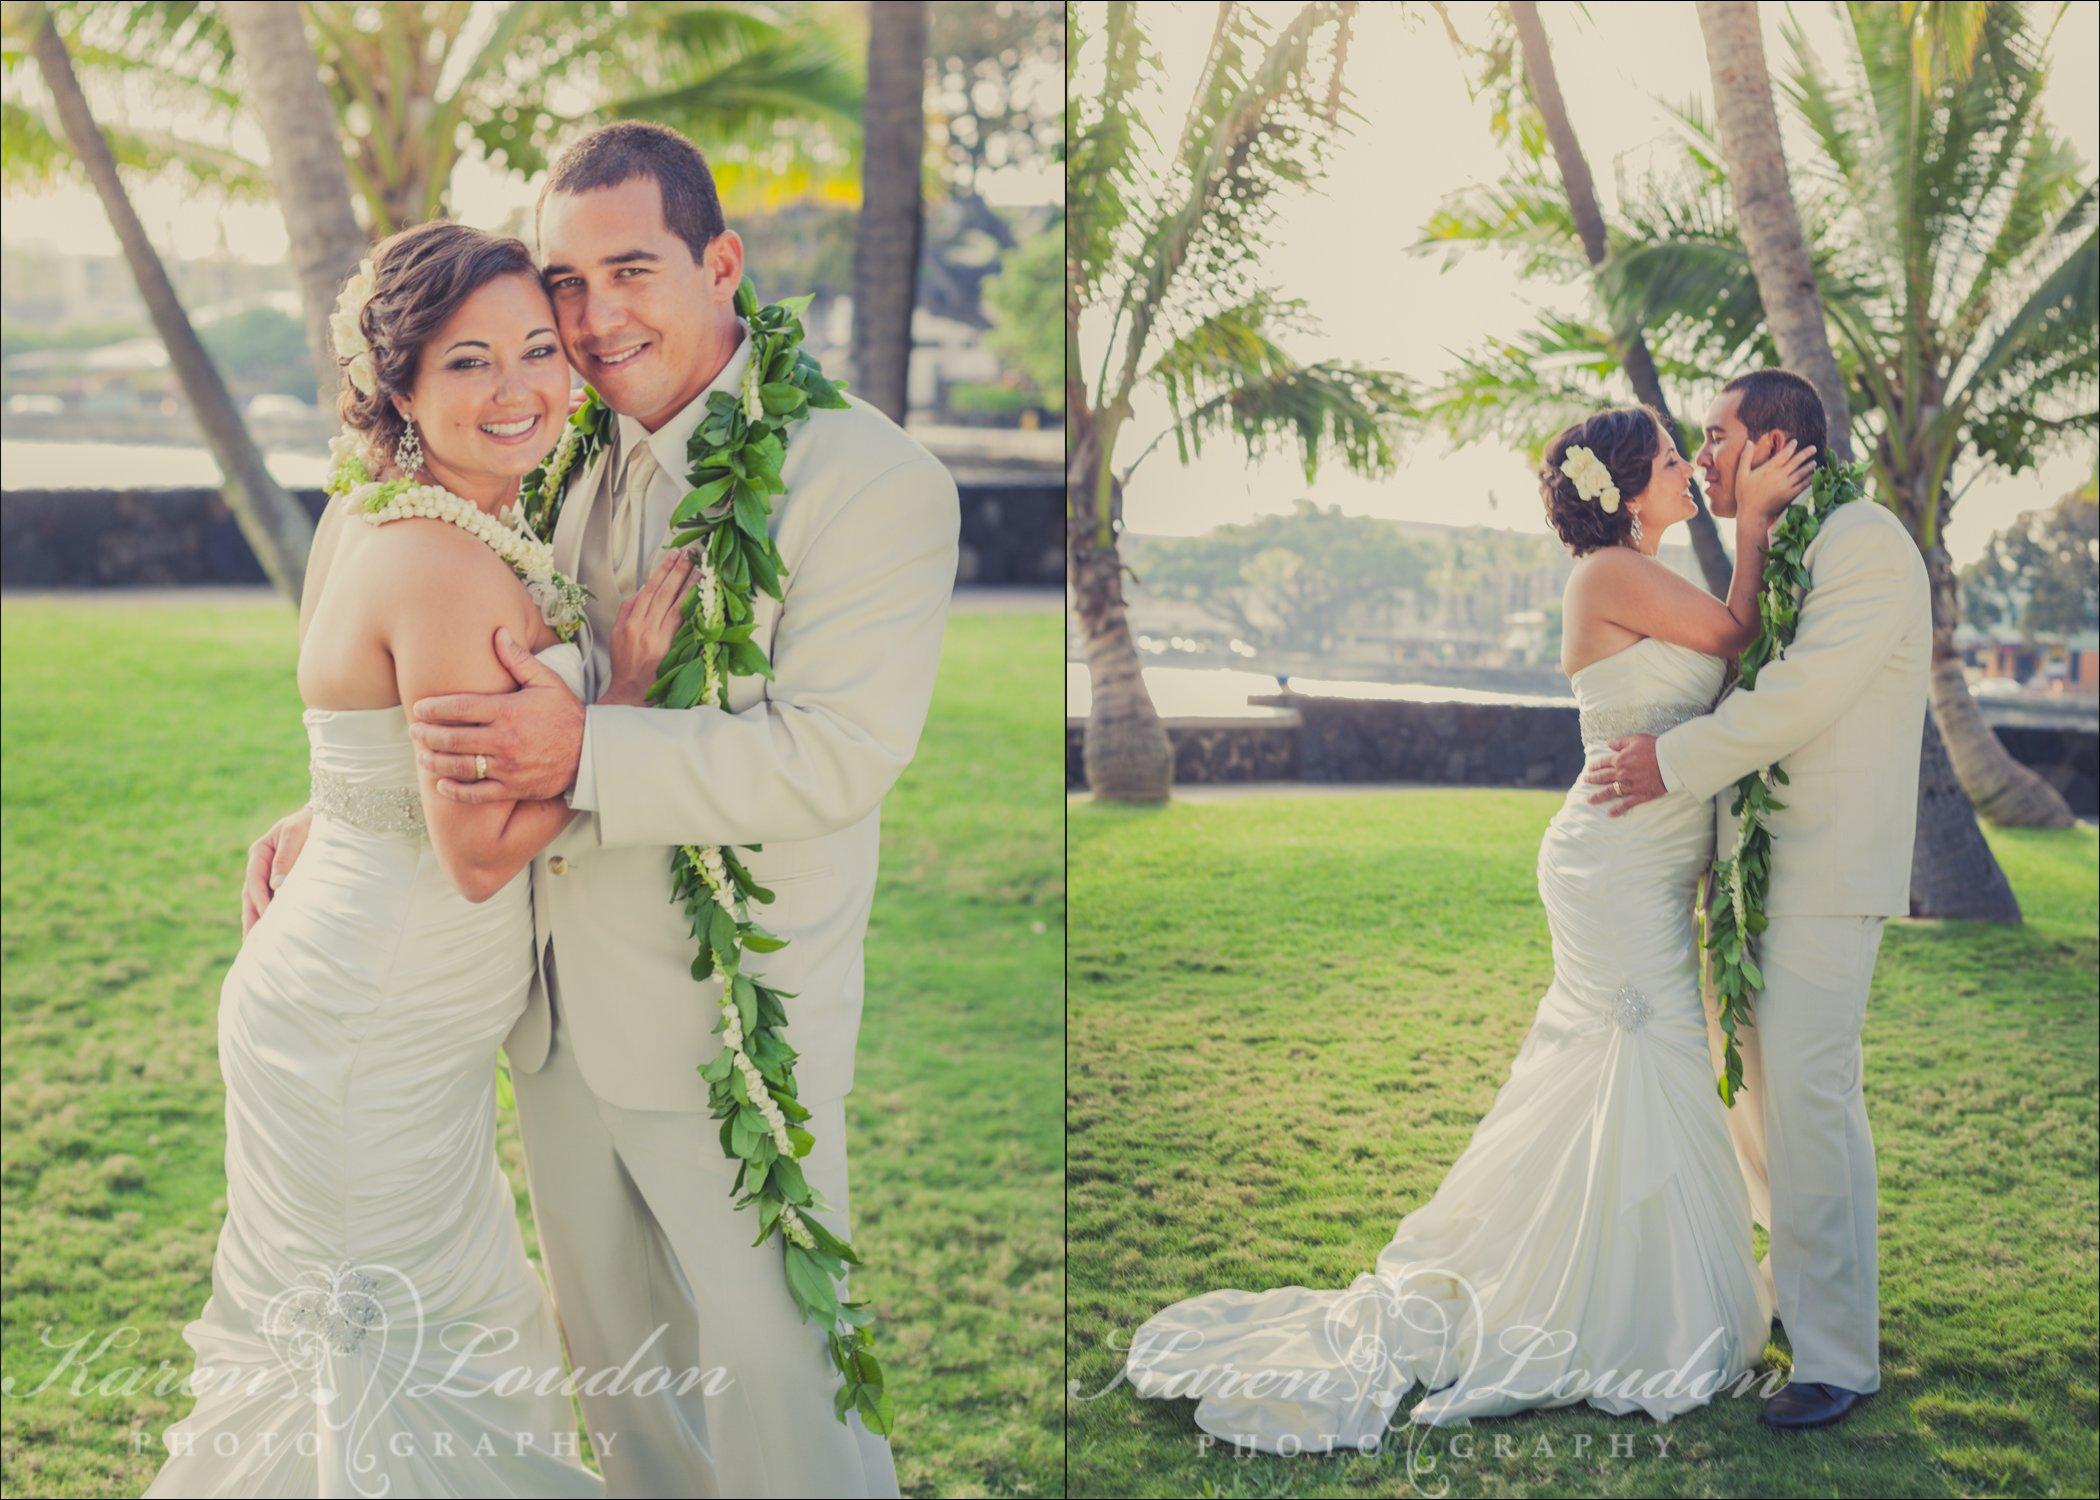 kailua kona wedding photographer archives - karen loudon